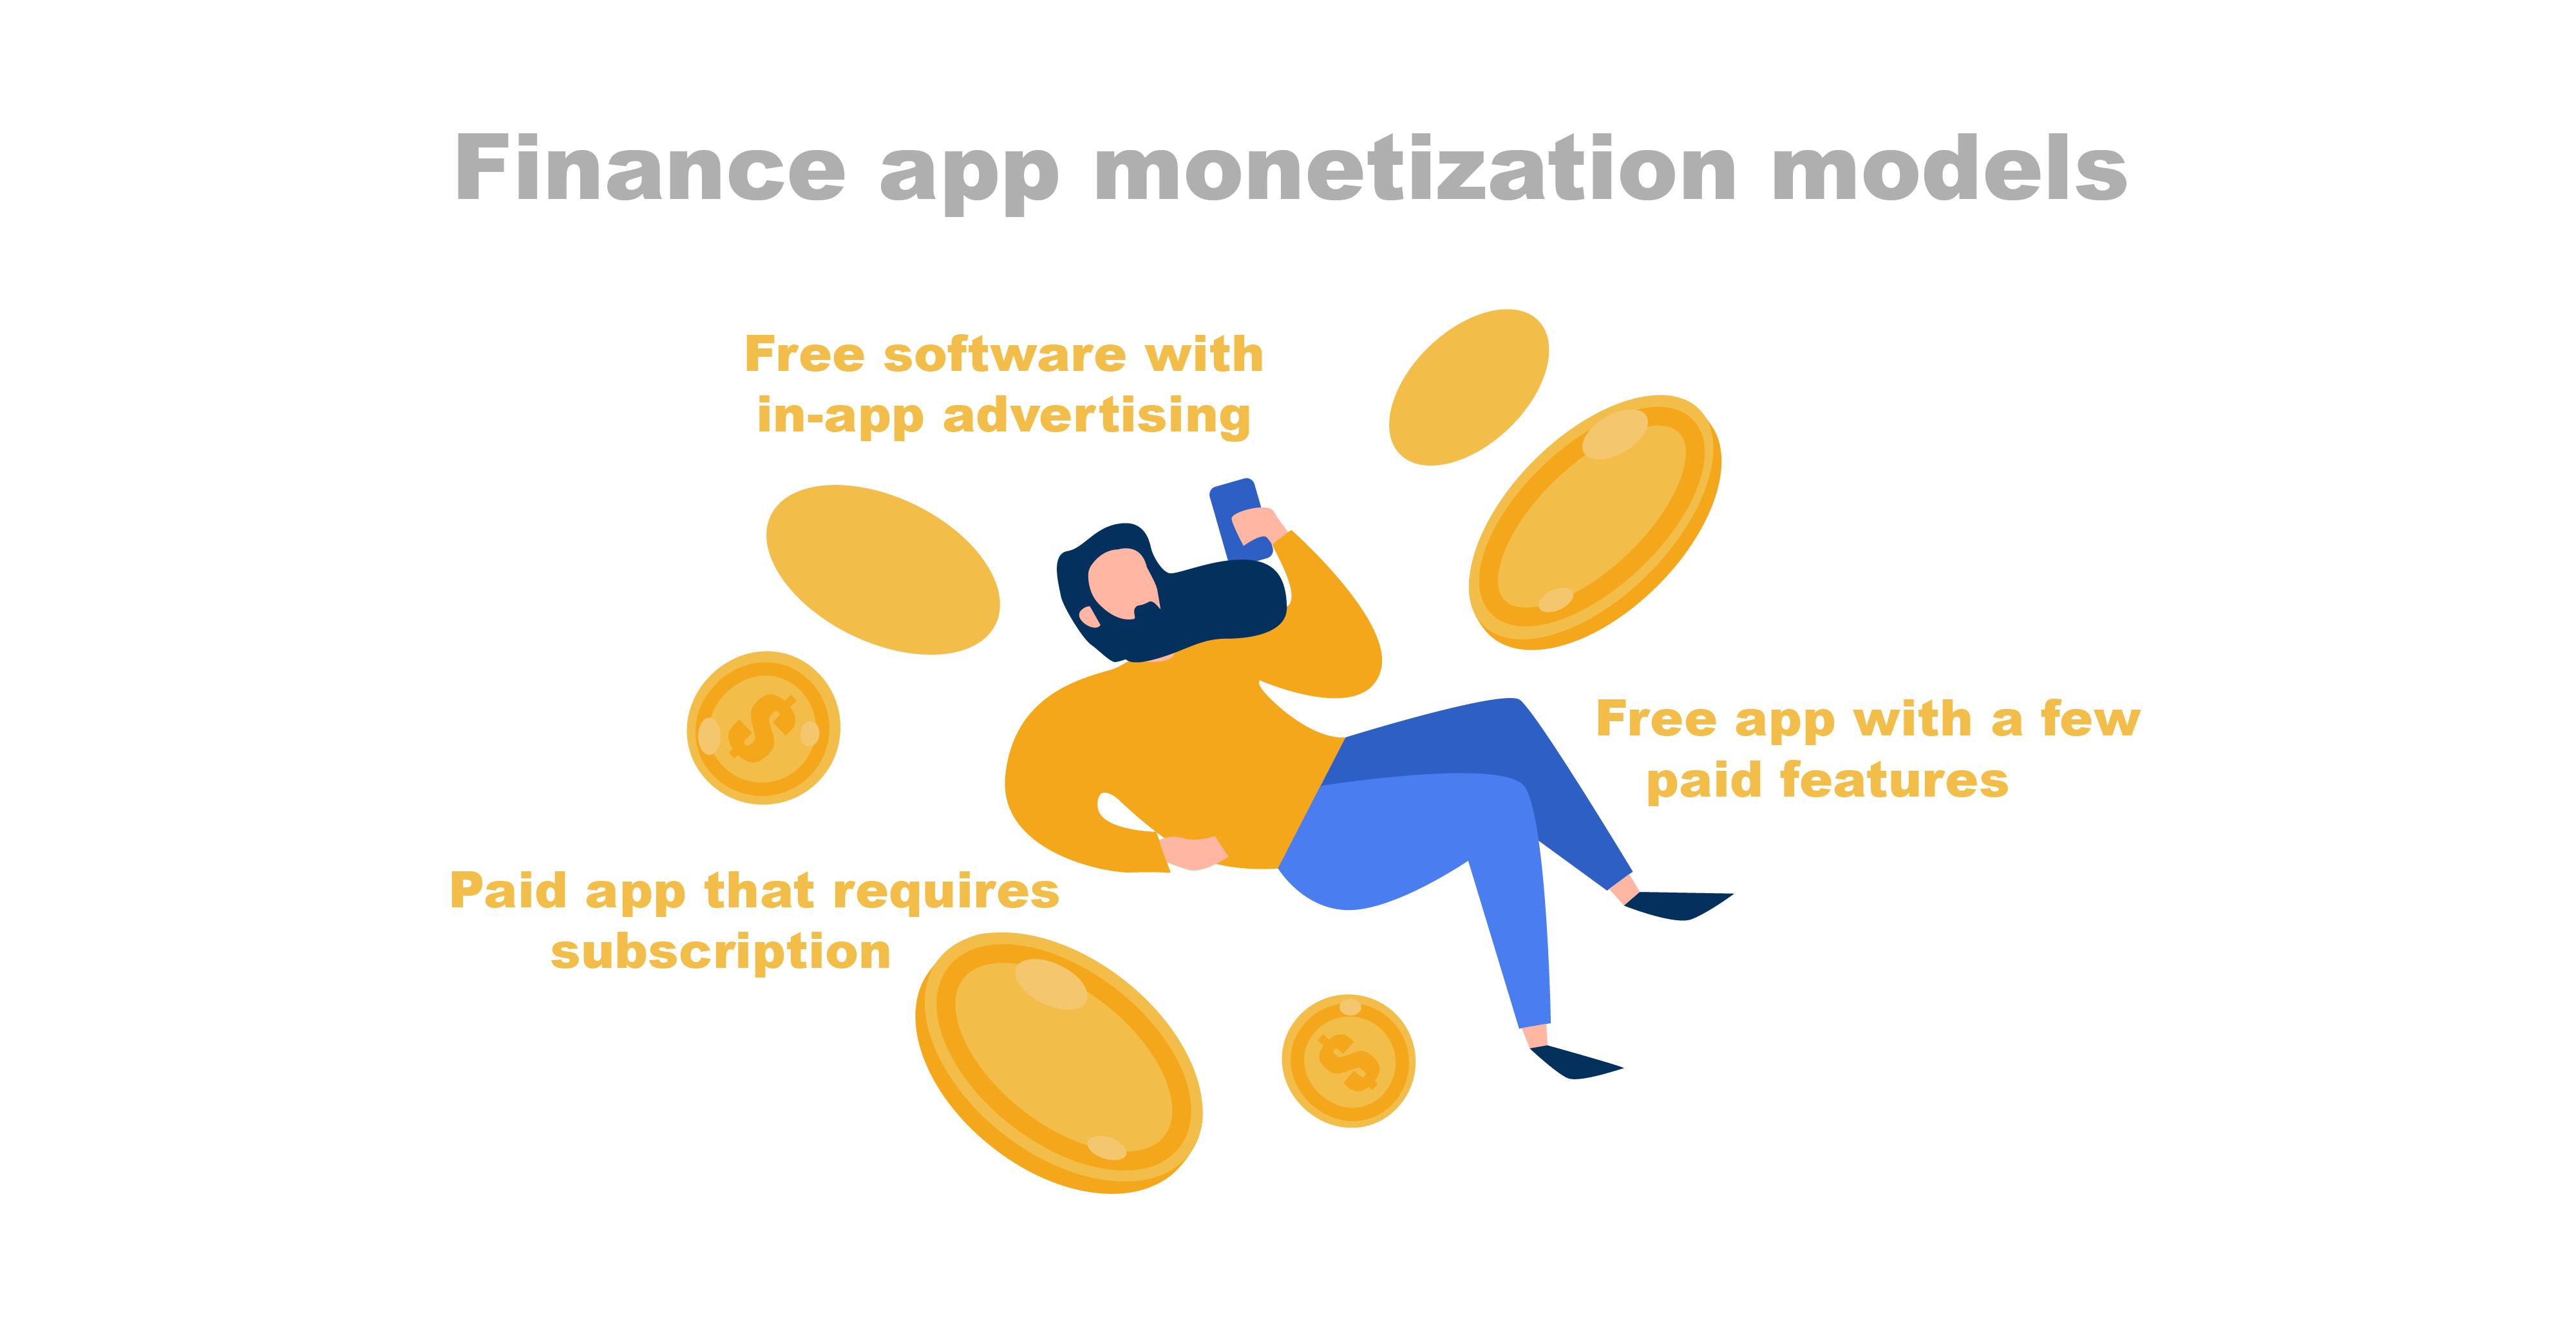 Finance app monetization models